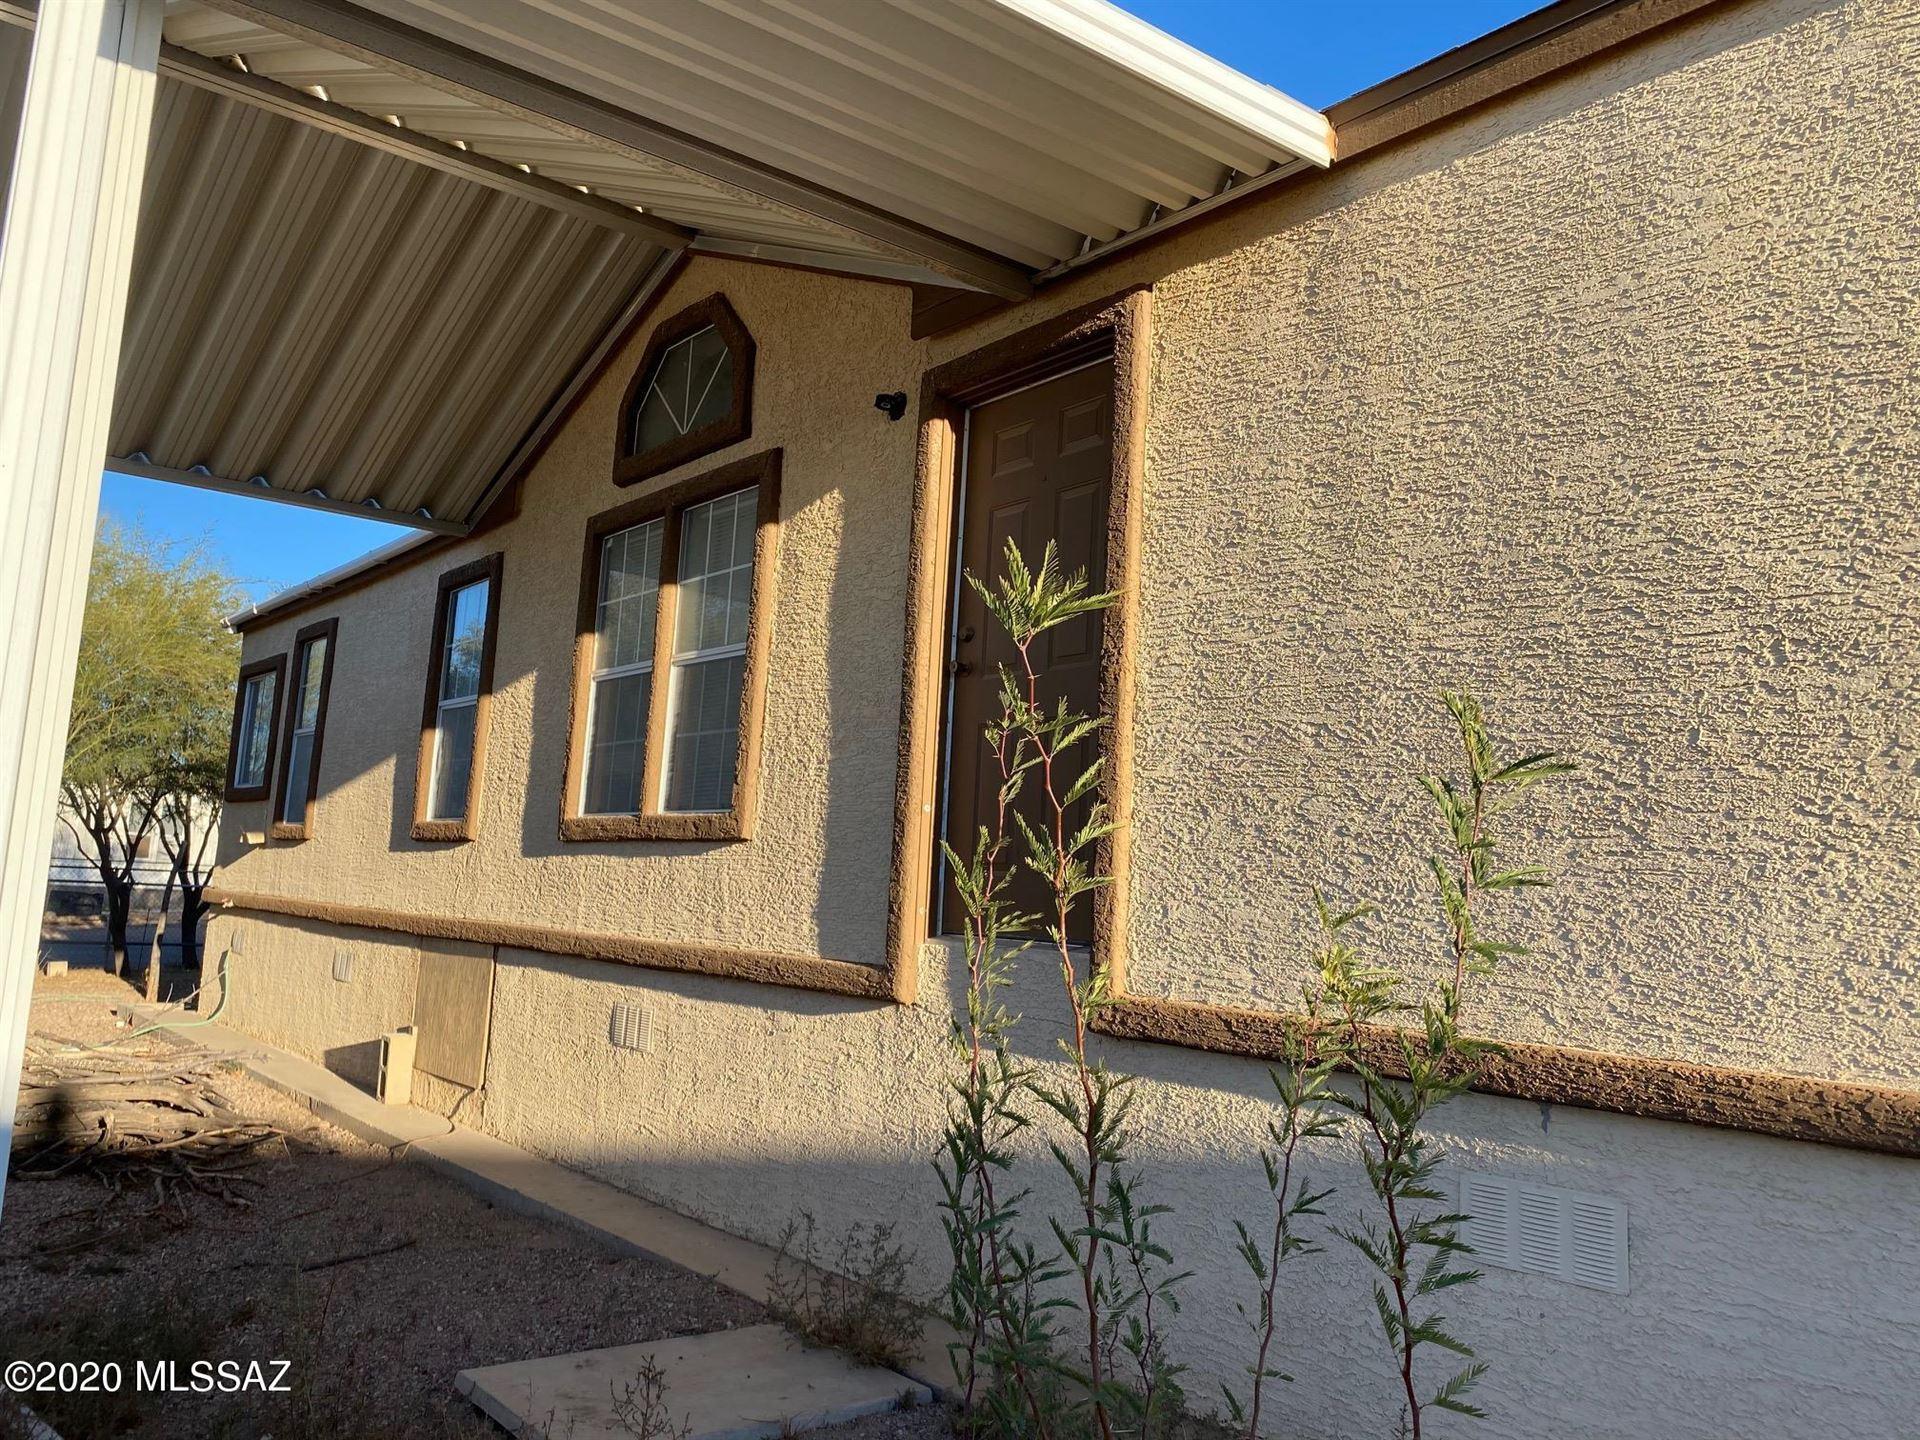 5920 S Cloverleaf S, Tucson, AZ 85757 - MLS#: 22031574